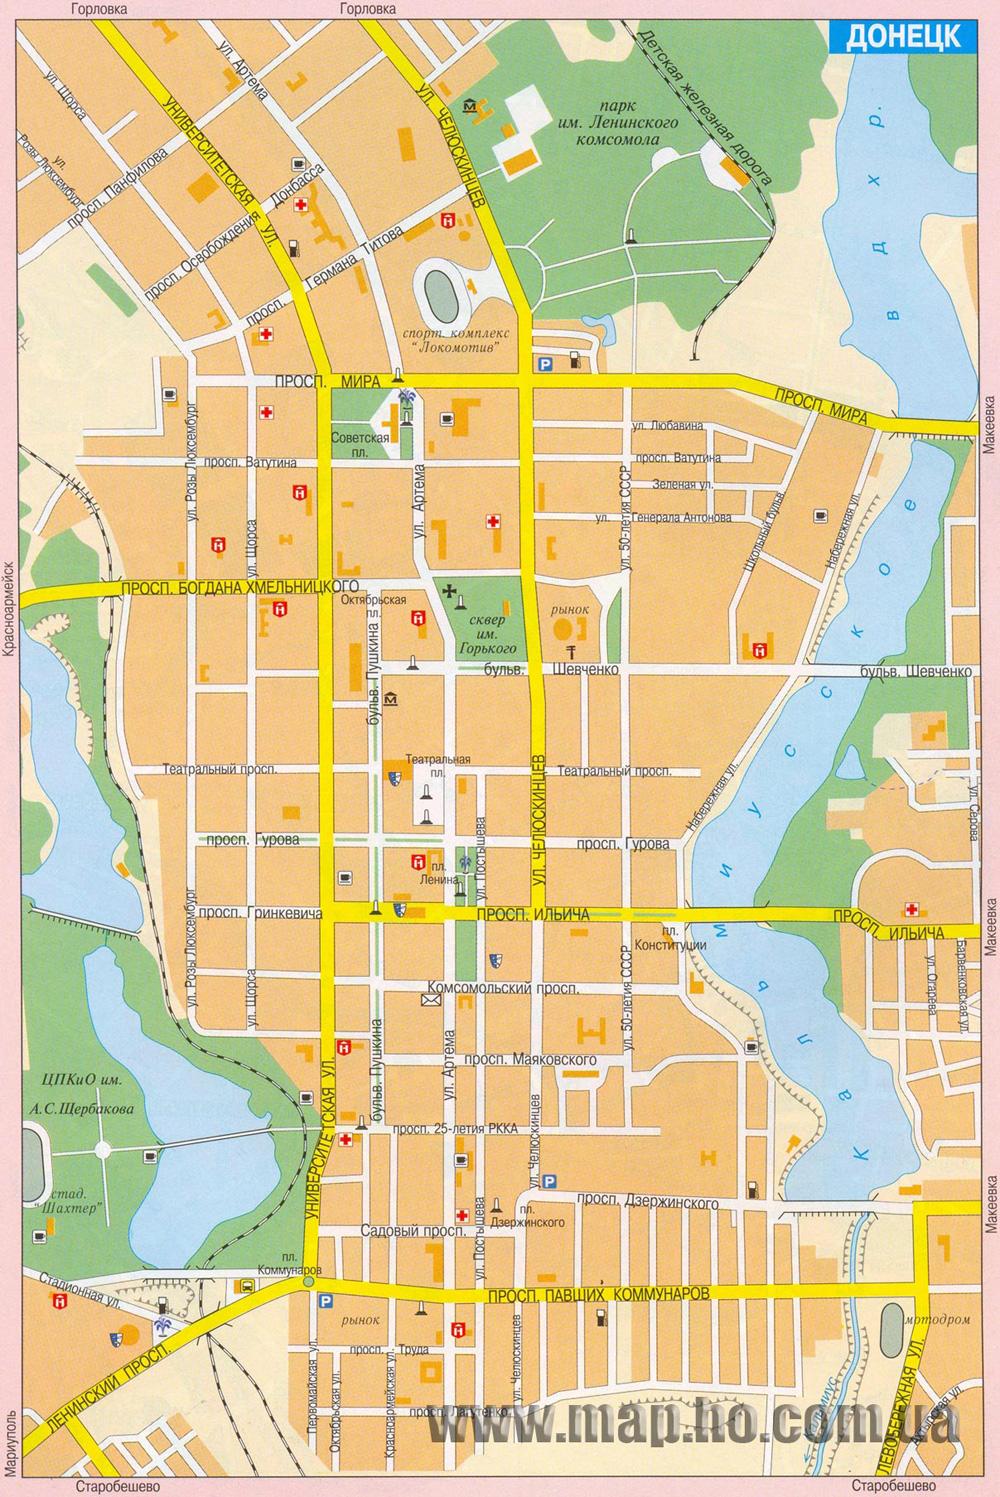 Карта города Донецк